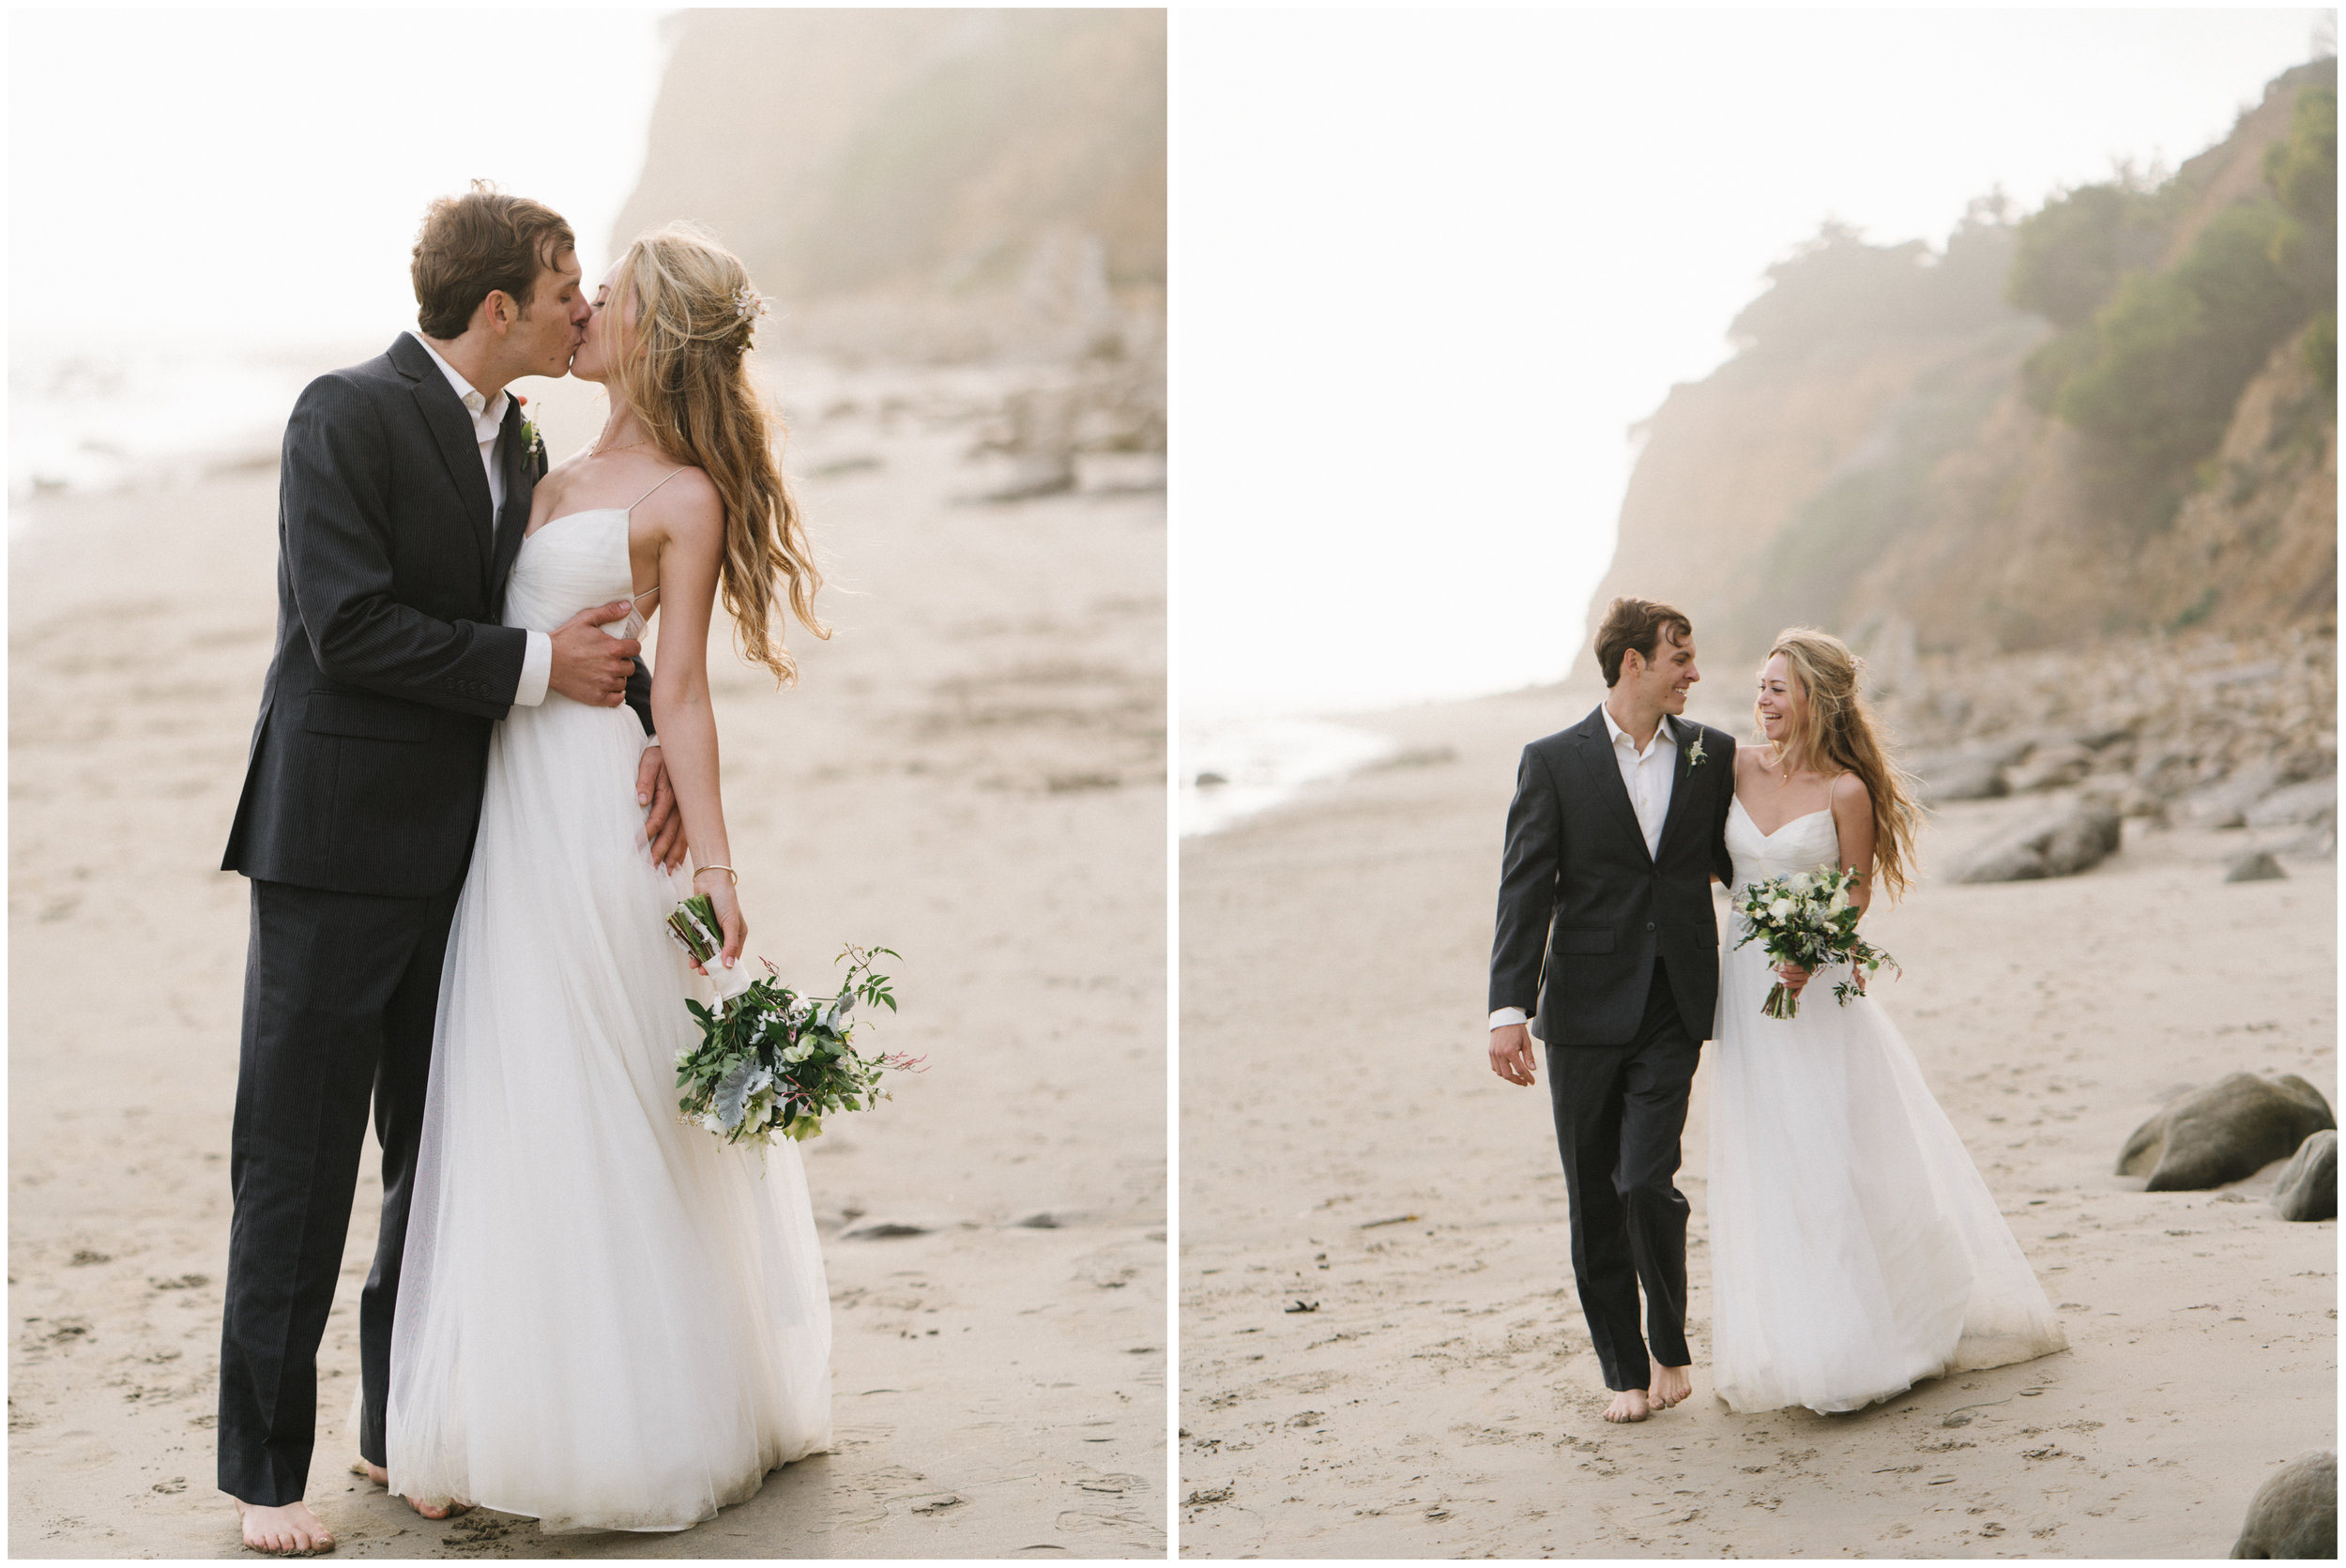 Santa Barbara Elopement Wedding Photographer - Pinnel Photography-14.jpg